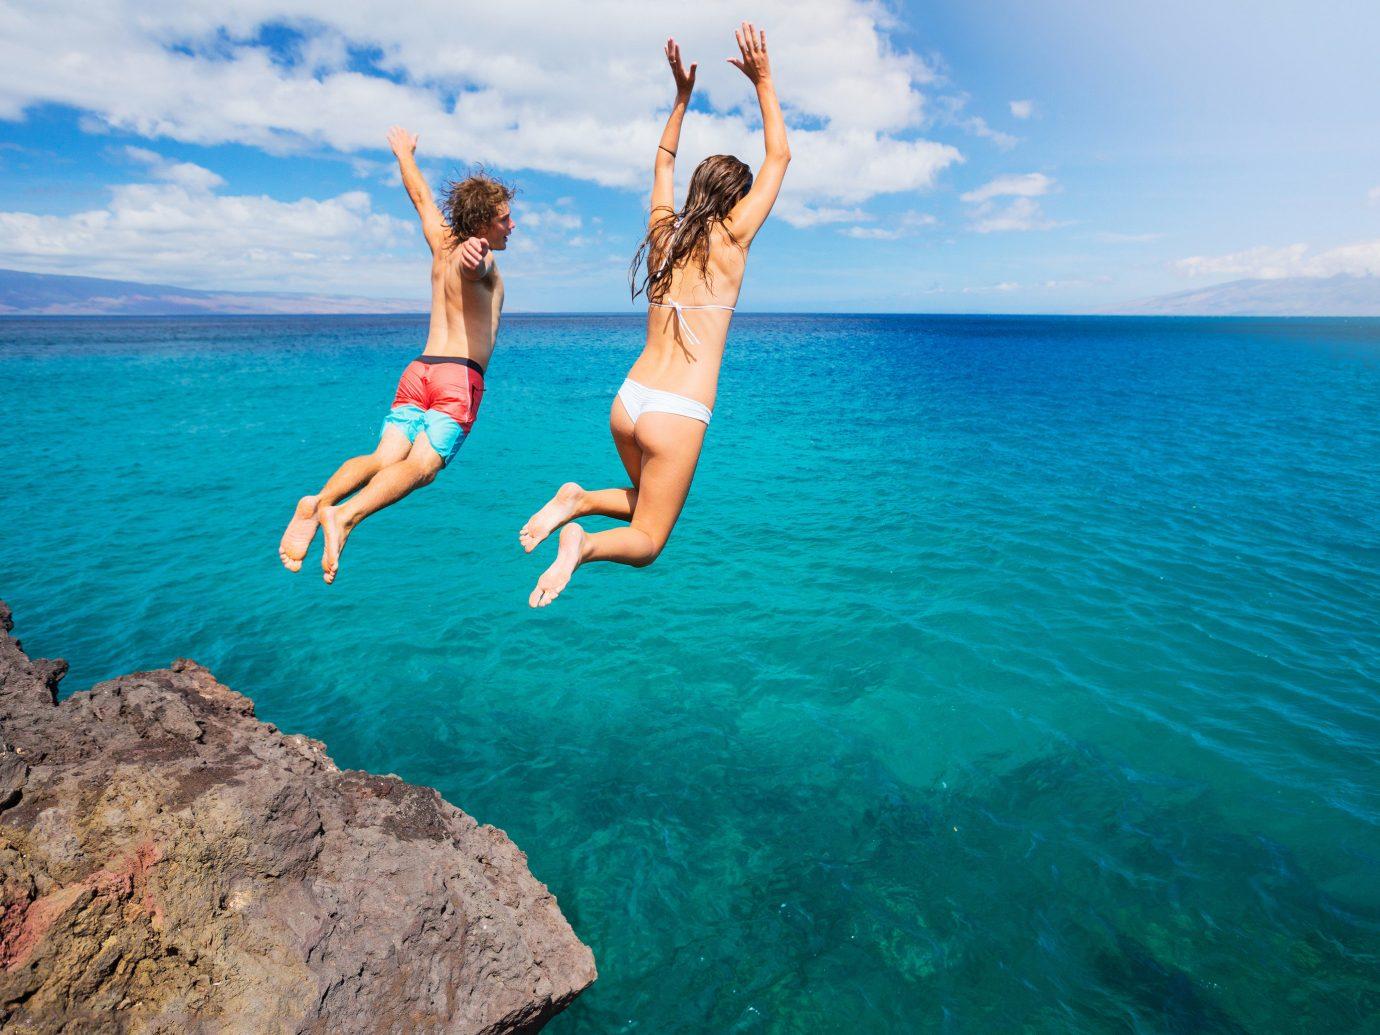 Offbeat water sky outdoor Sea Ocean vacation water sport Beach swimming Coast caribbean Nature cape bay jumping beautiful day